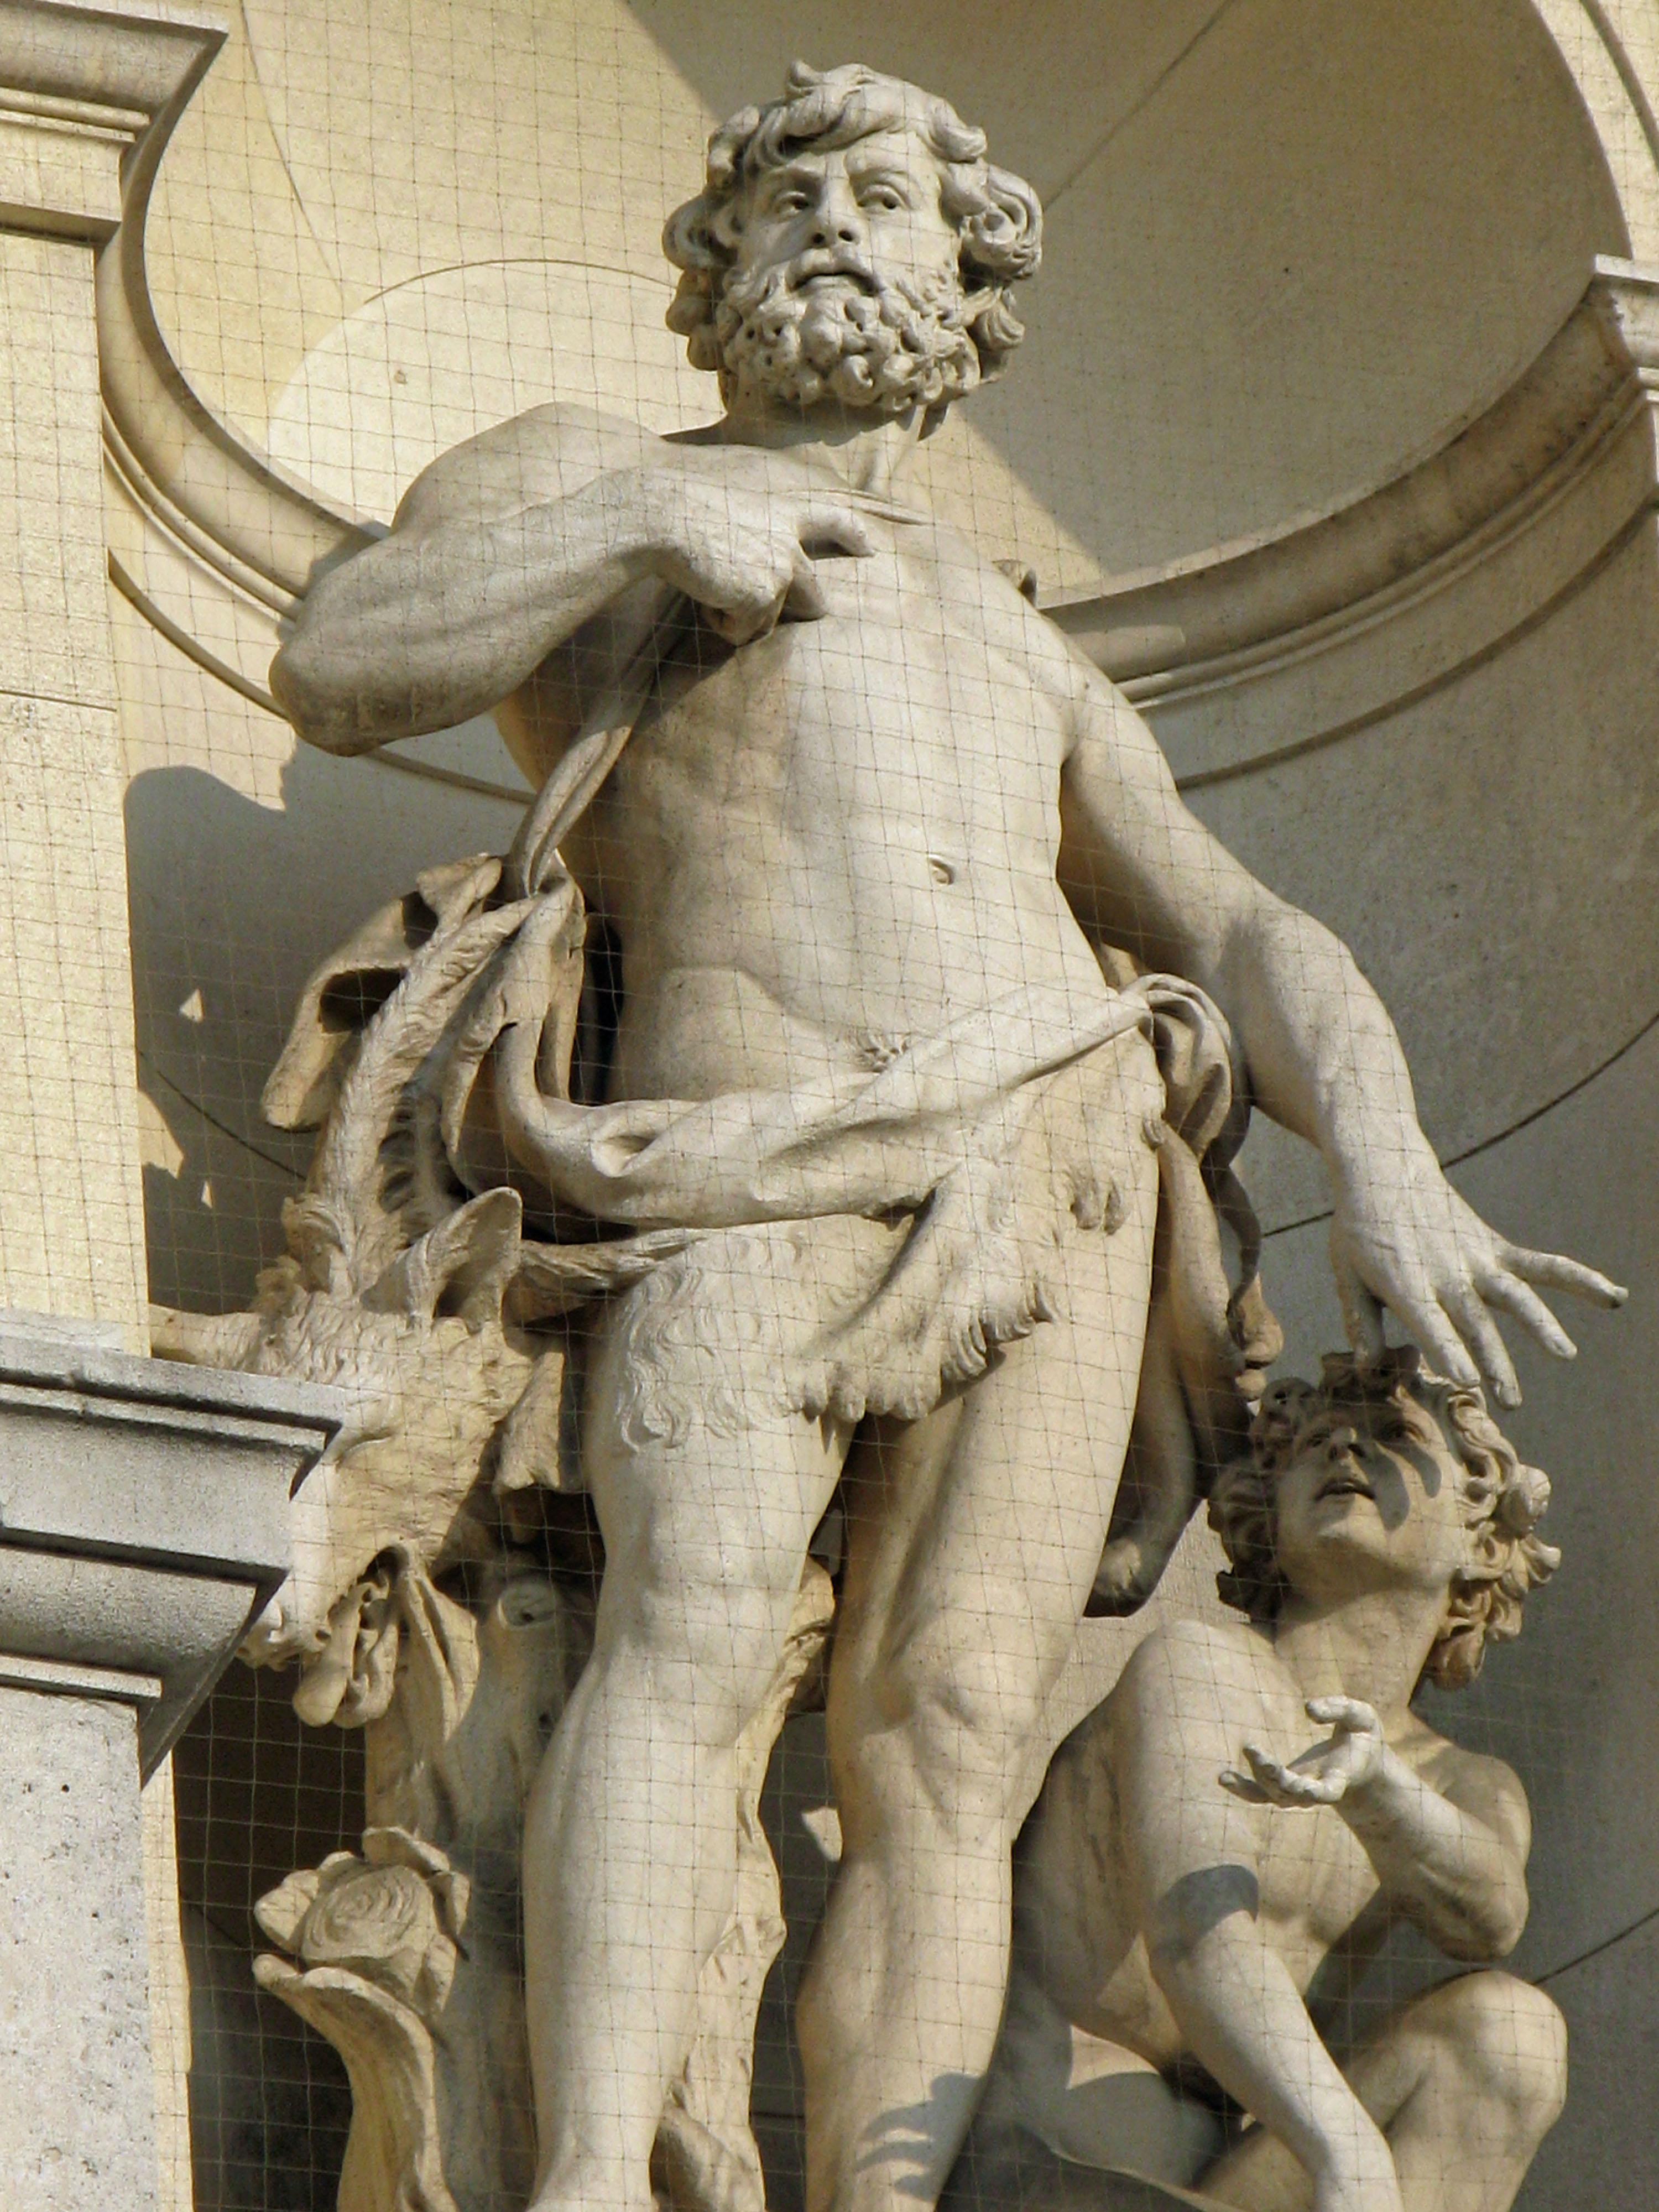 Hot Gay Statues: Vienna,